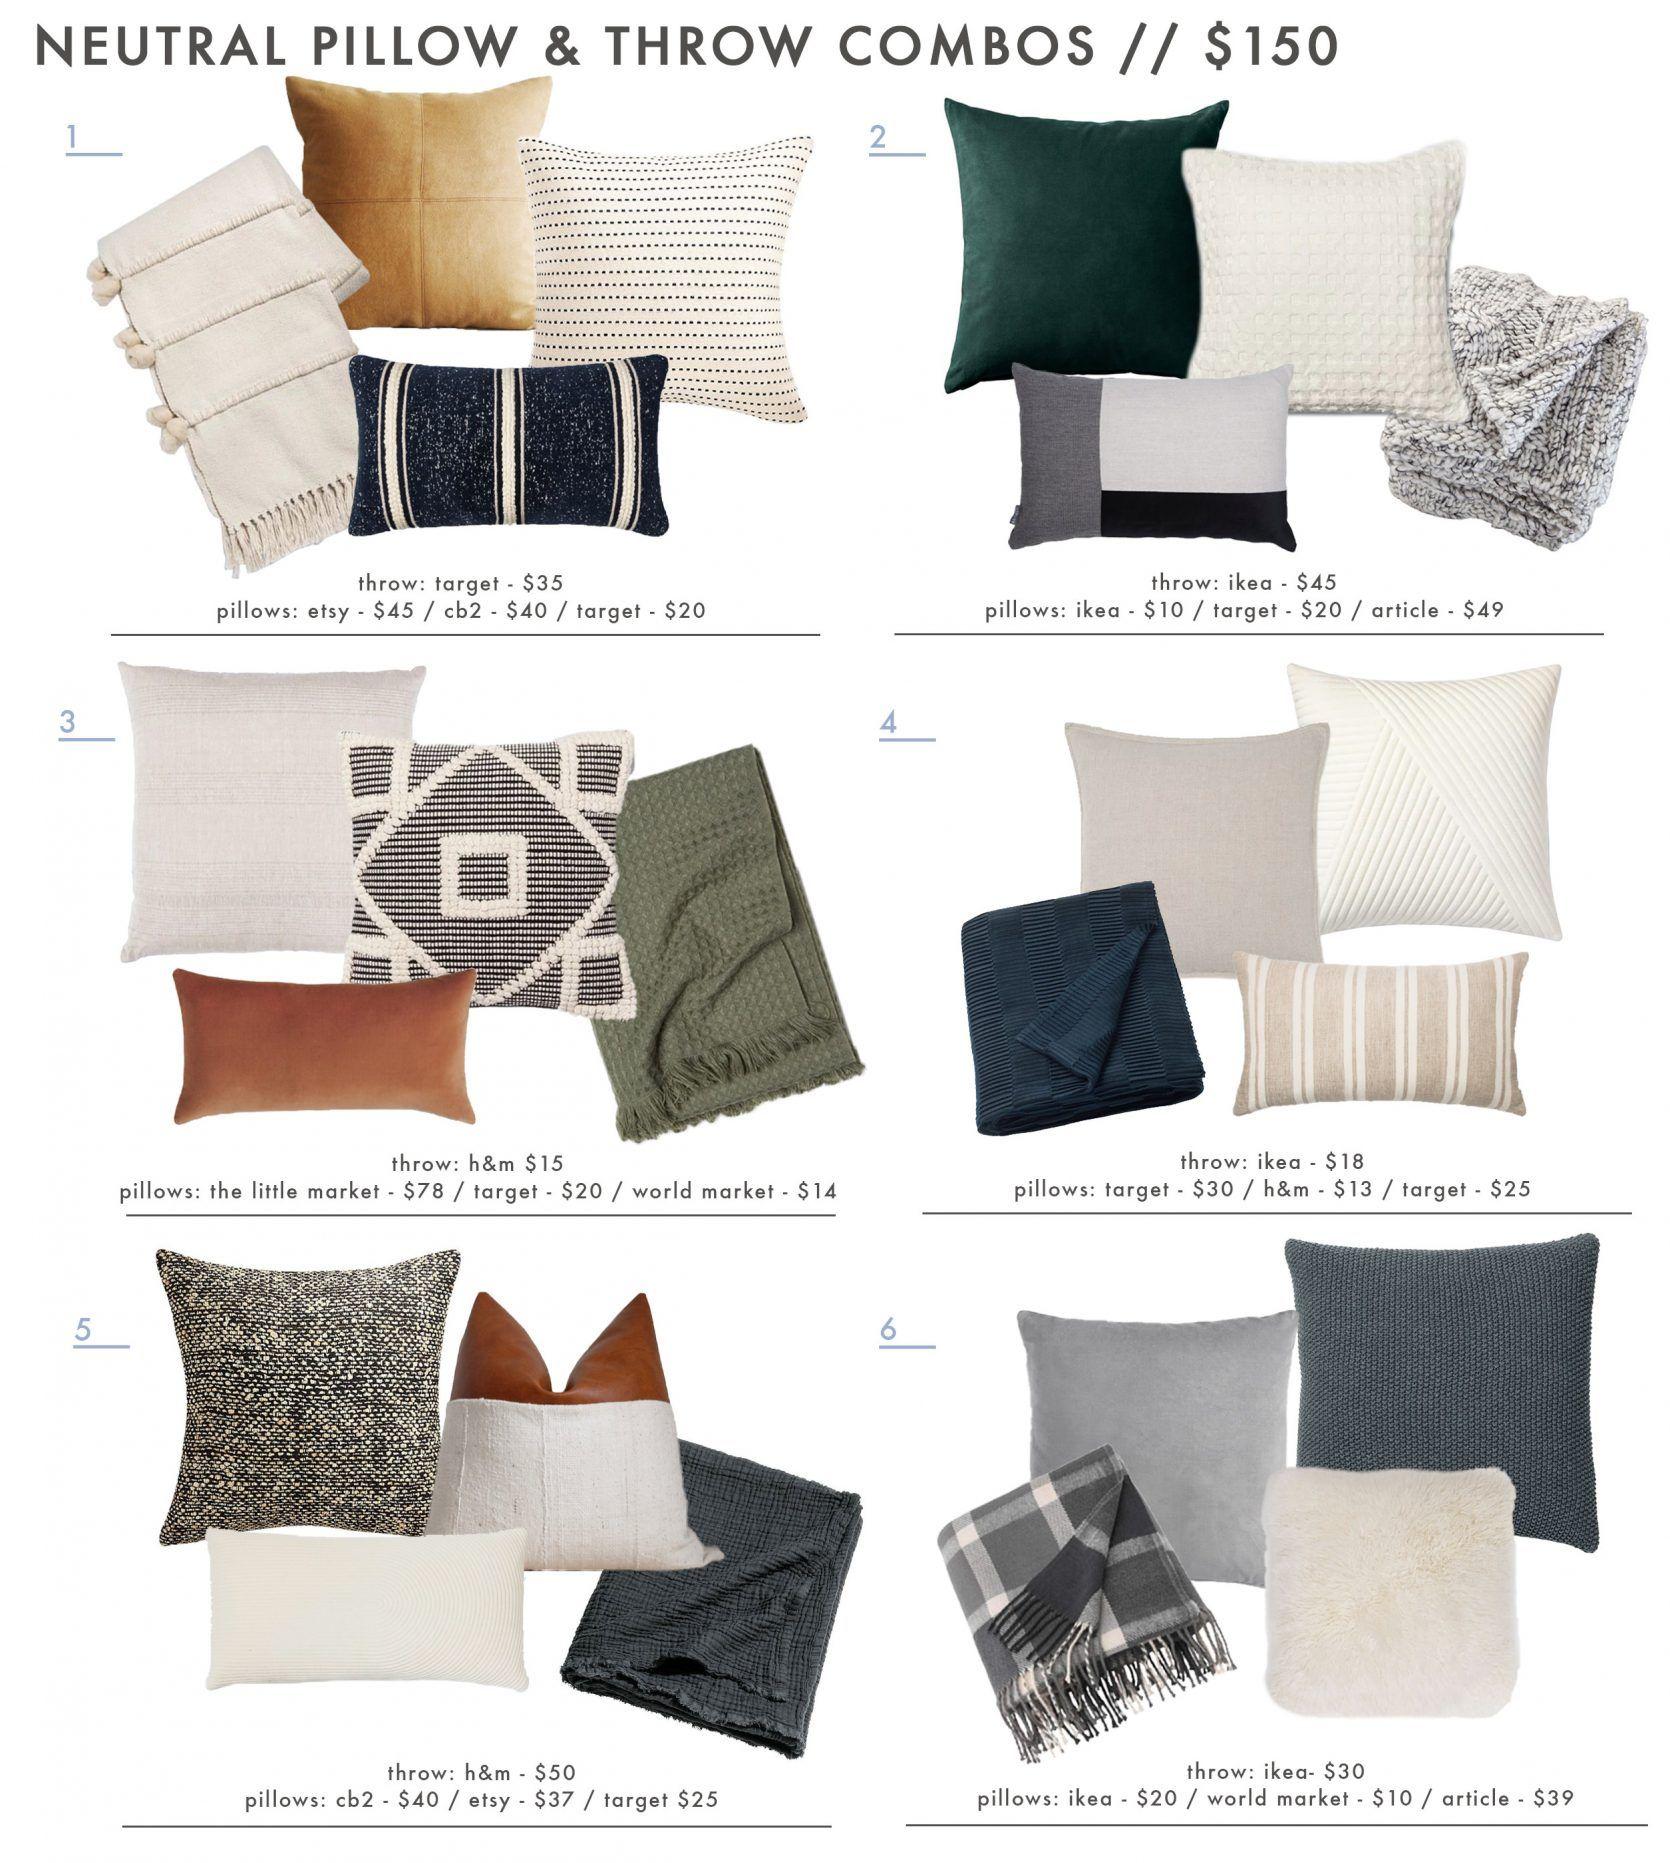 10 My pillow ideas   pillows, decorative pillows, throw pillows